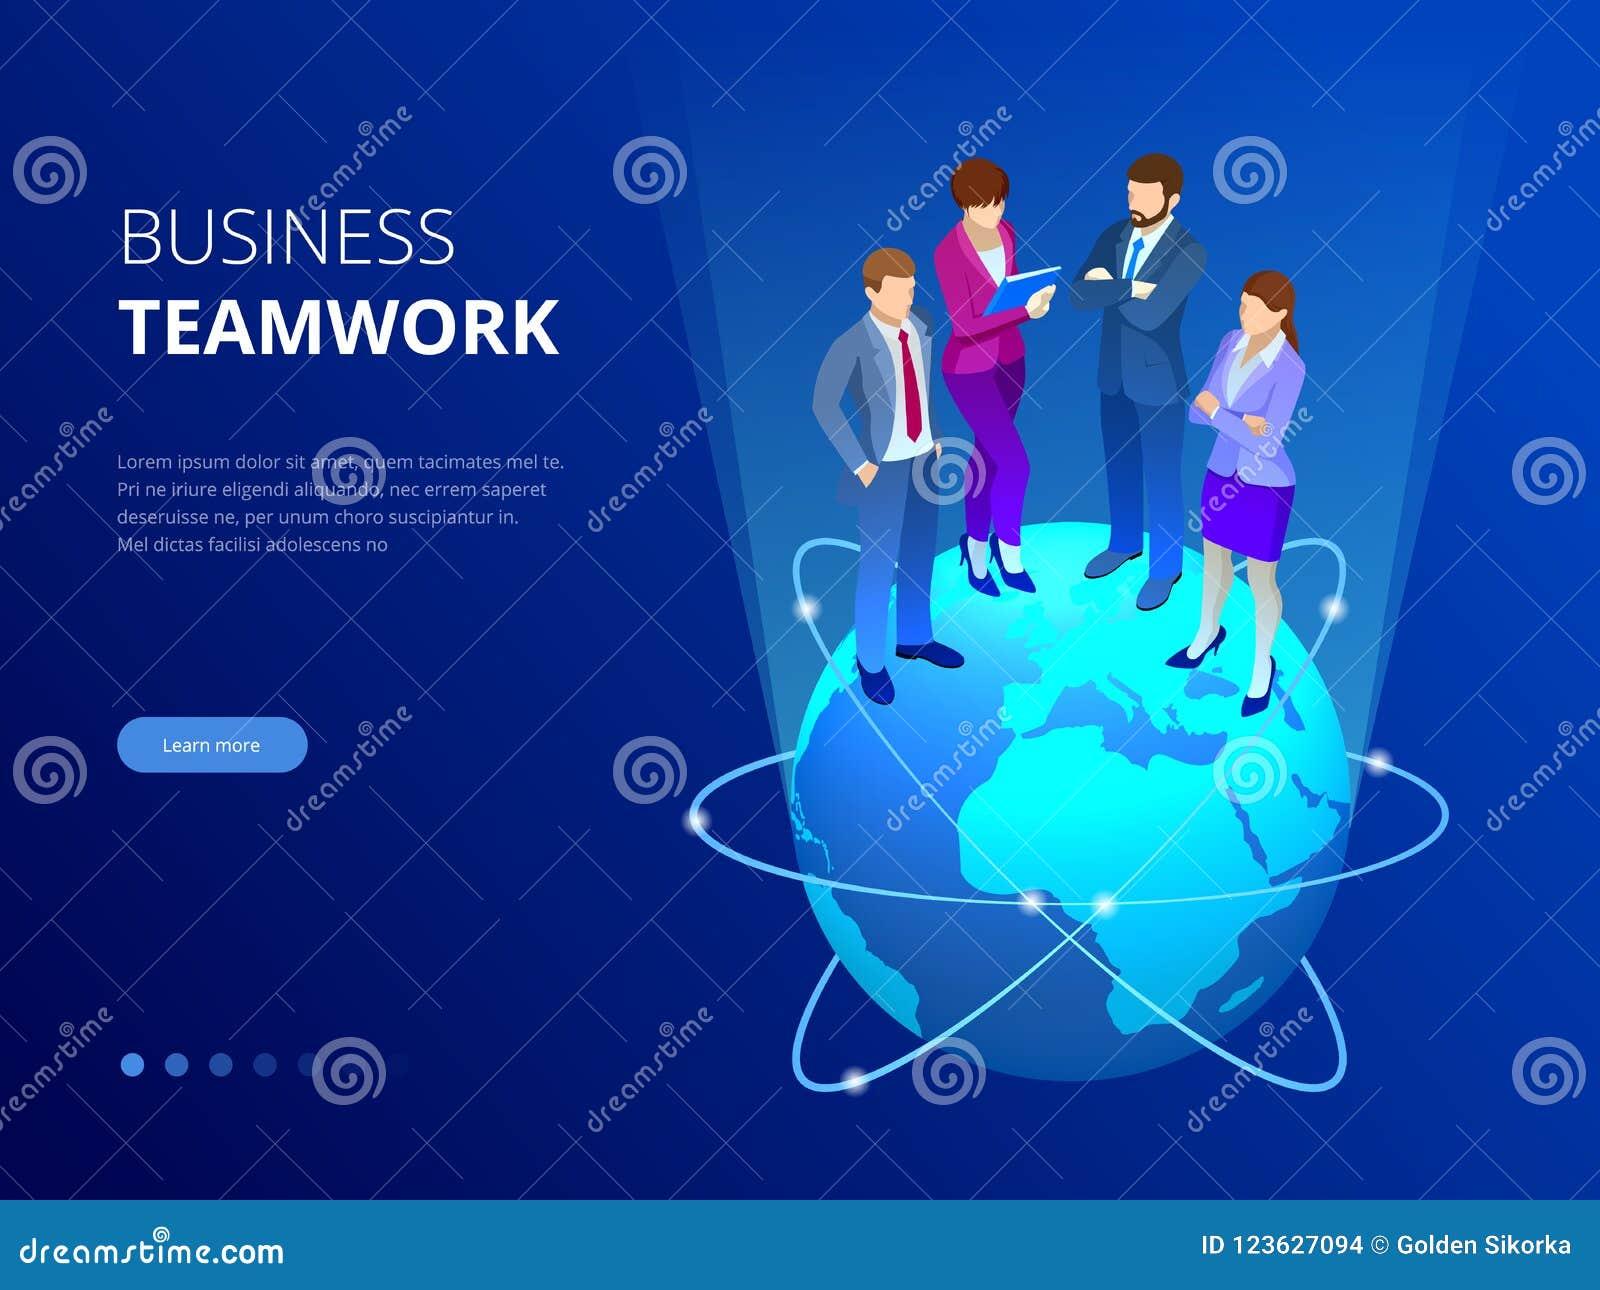 Isometric επιχειρησιακή ομάδα, έννοια επιχειρηματιών Έμβλημα Ιστού Οι επιχειρηματίες στέκονται σε μια παγκόσμια σφαίρα ιδέες νέες